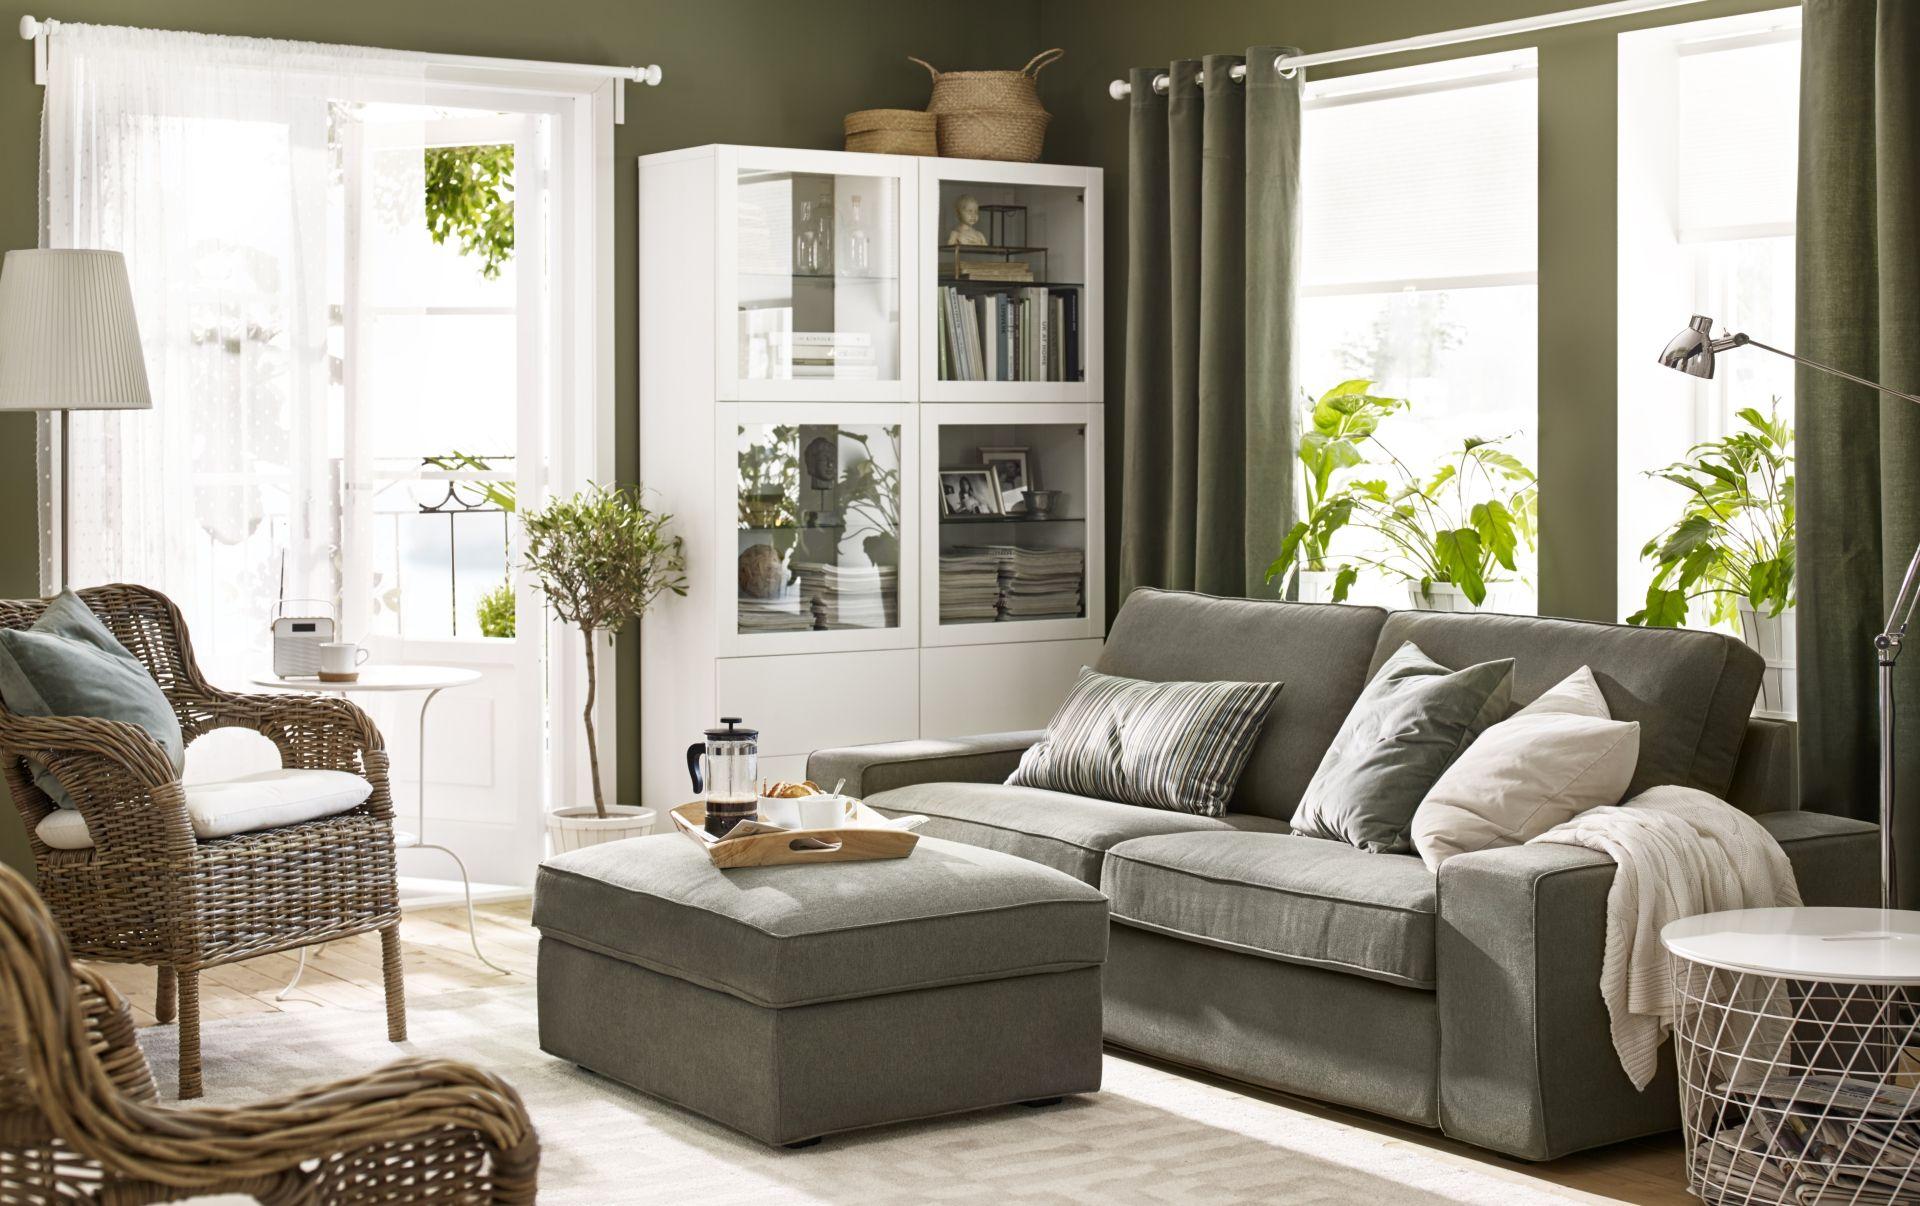 stunning kivik zitsbank borred grijsgroen ikea with ikea. Black Bedroom Furniture Sets. Home Design Ideas